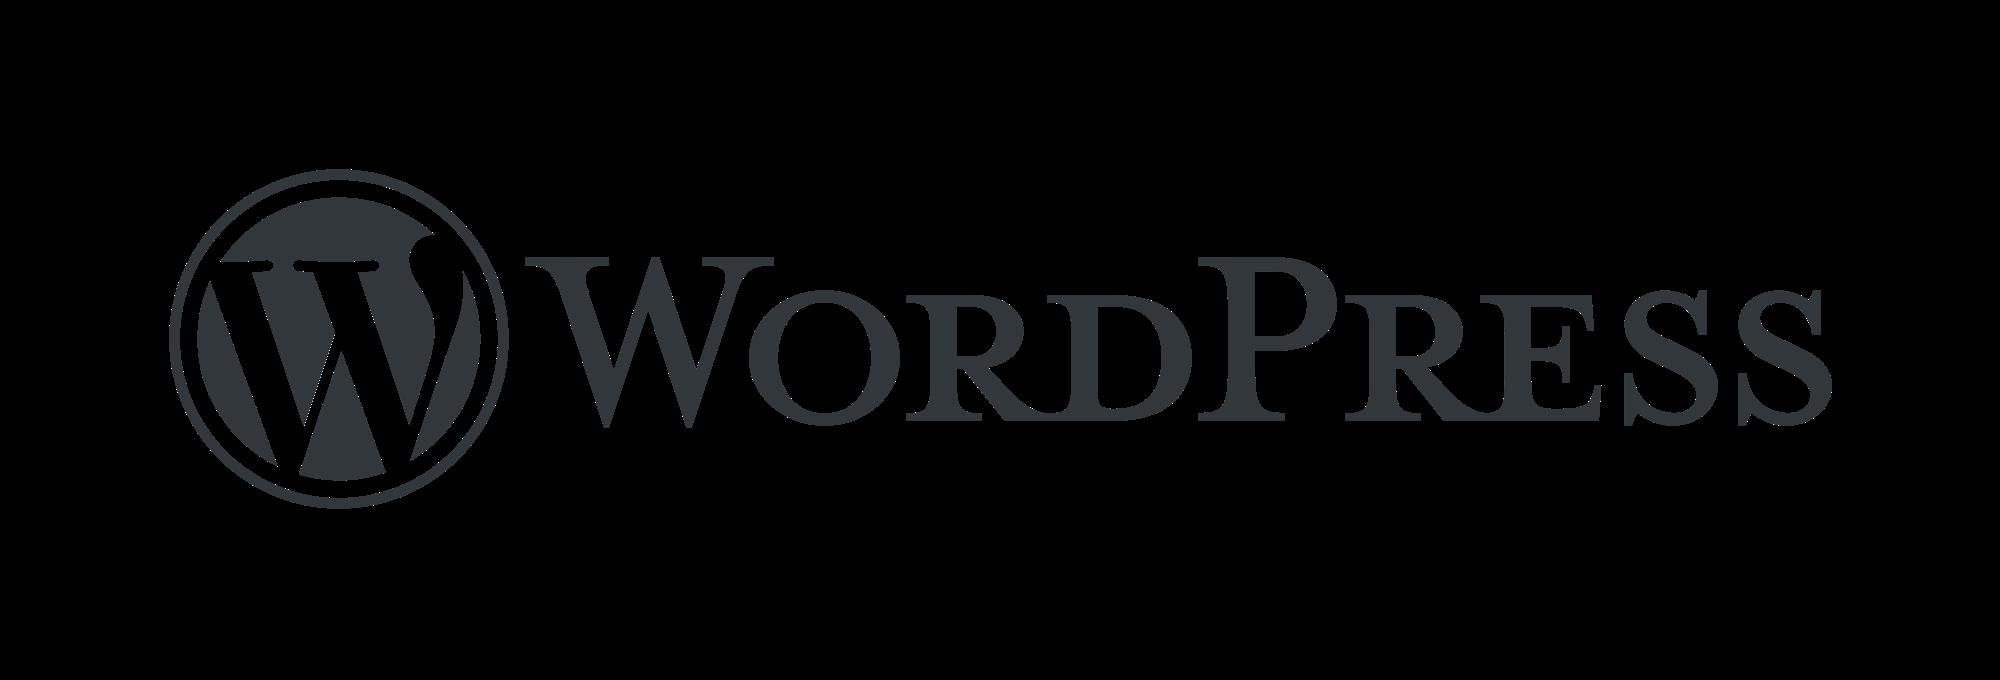 WordPress-logotype-standard copy